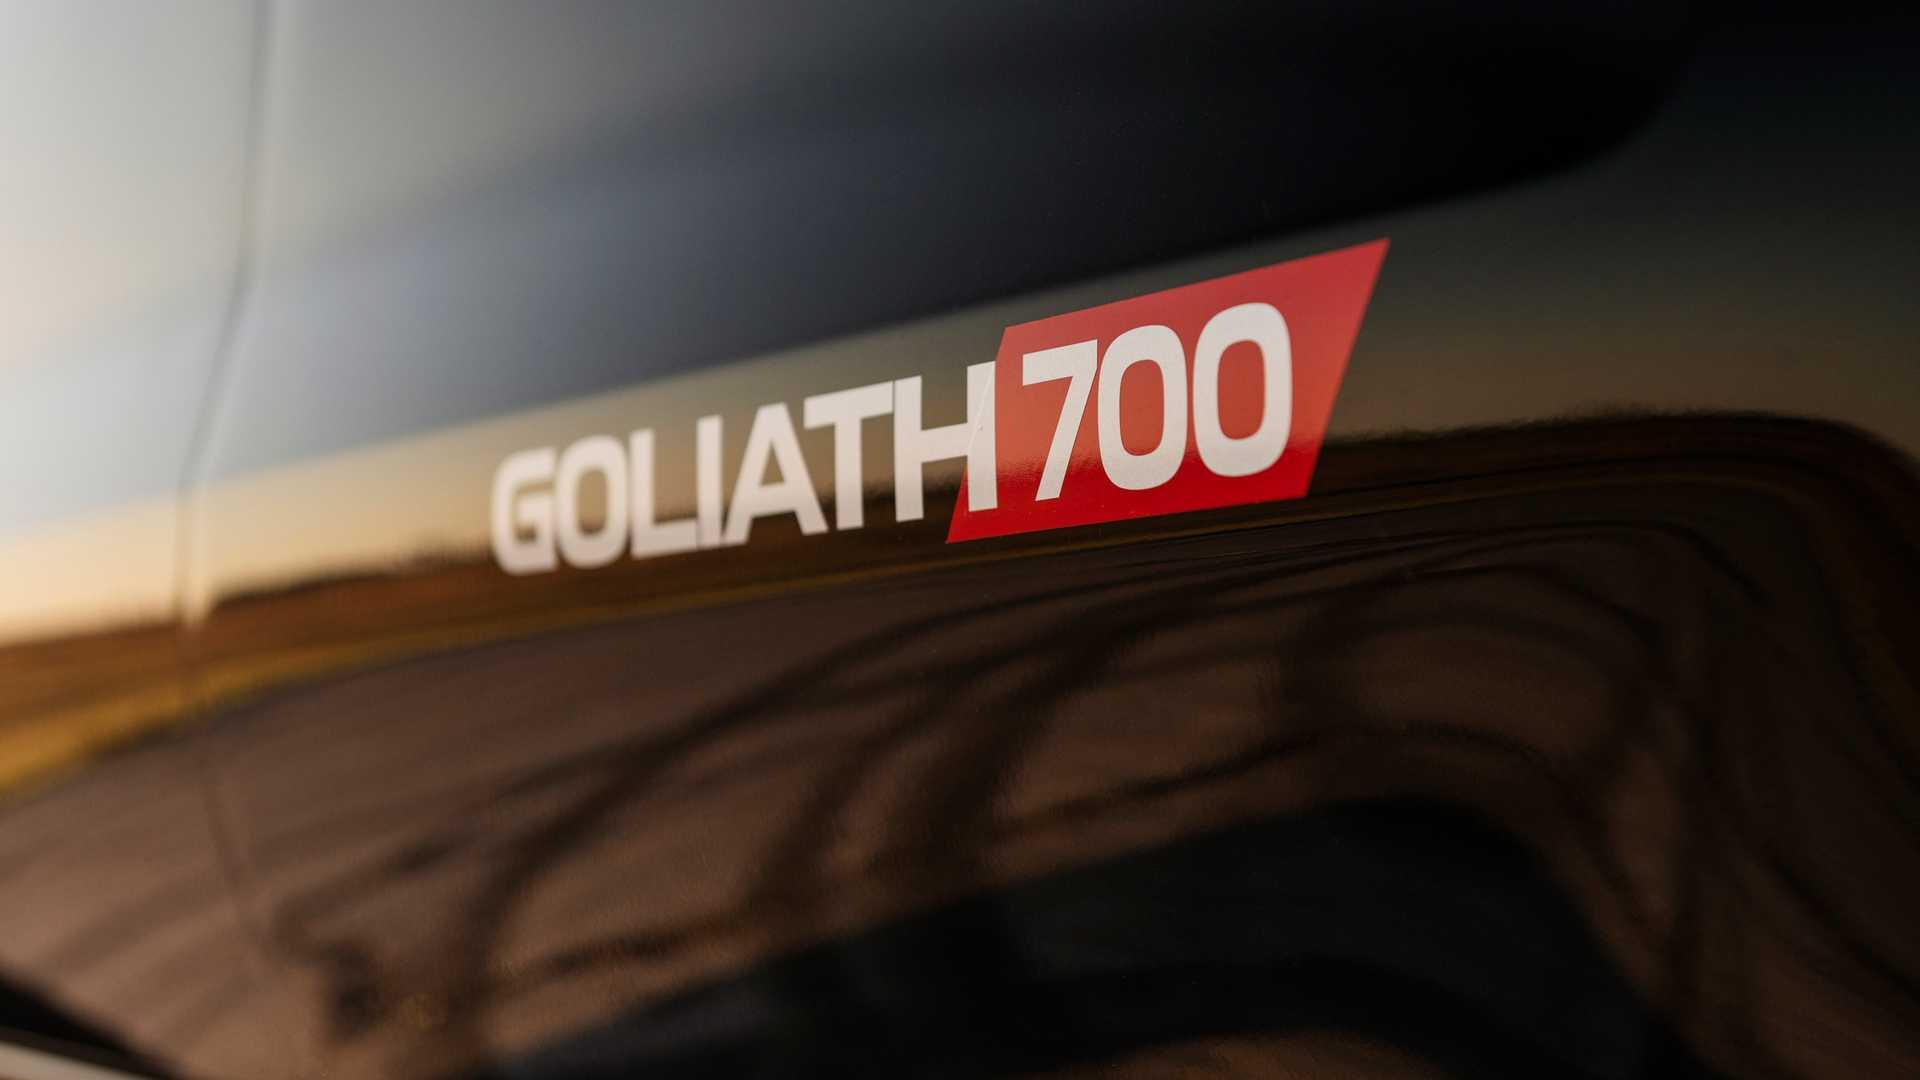 hennessey-goliath-700-gmc-sierra-denali-13